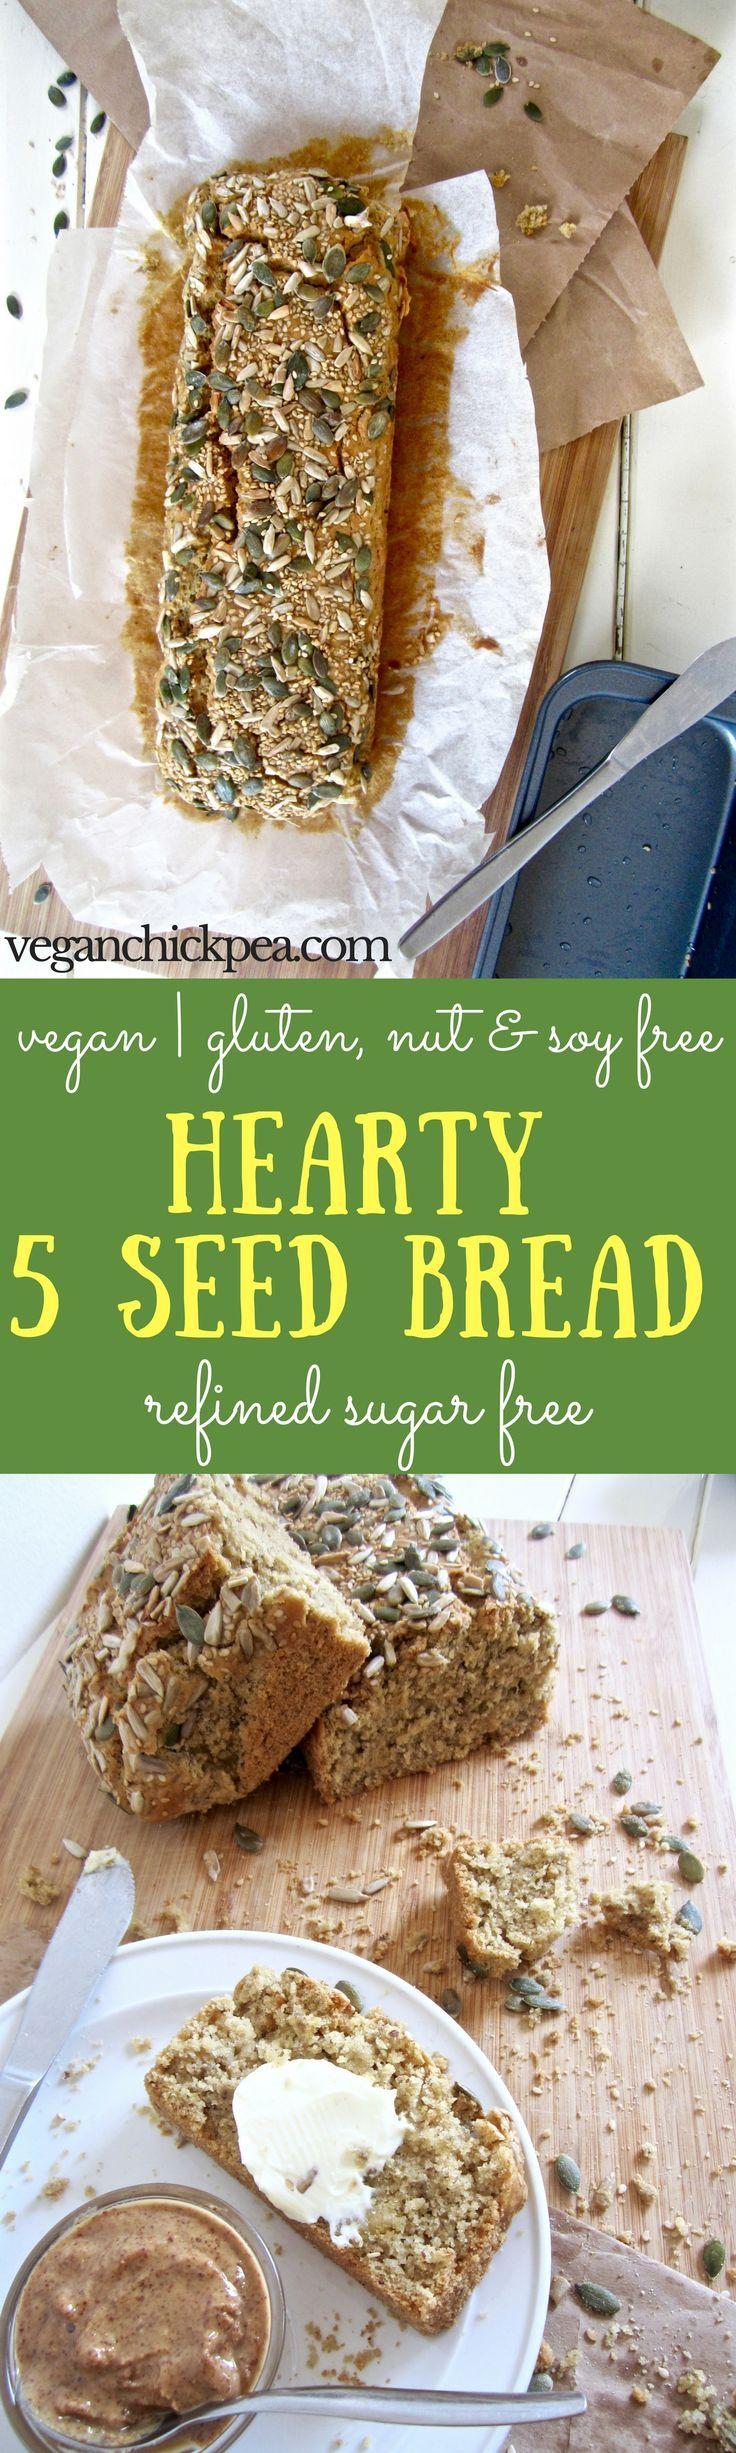 Hearty 5 Seed Bread recipe - an everyday bread that is vegan, gluten / nut / refined sugar free! | veganchickpea.com